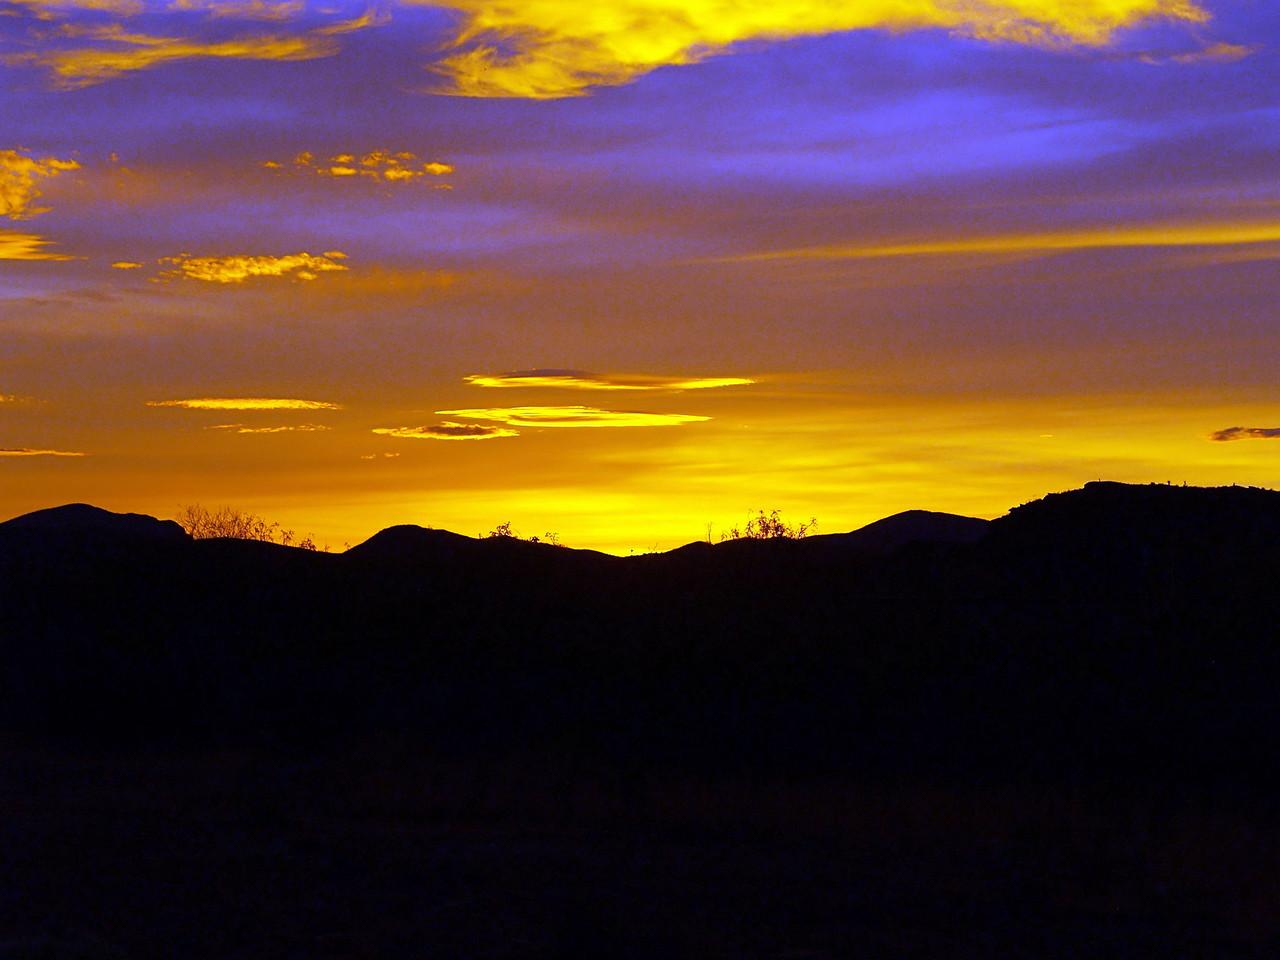 OLYMPUS DIGITAL CAMERA--Beautiful sunset over Van Horn, Texas.